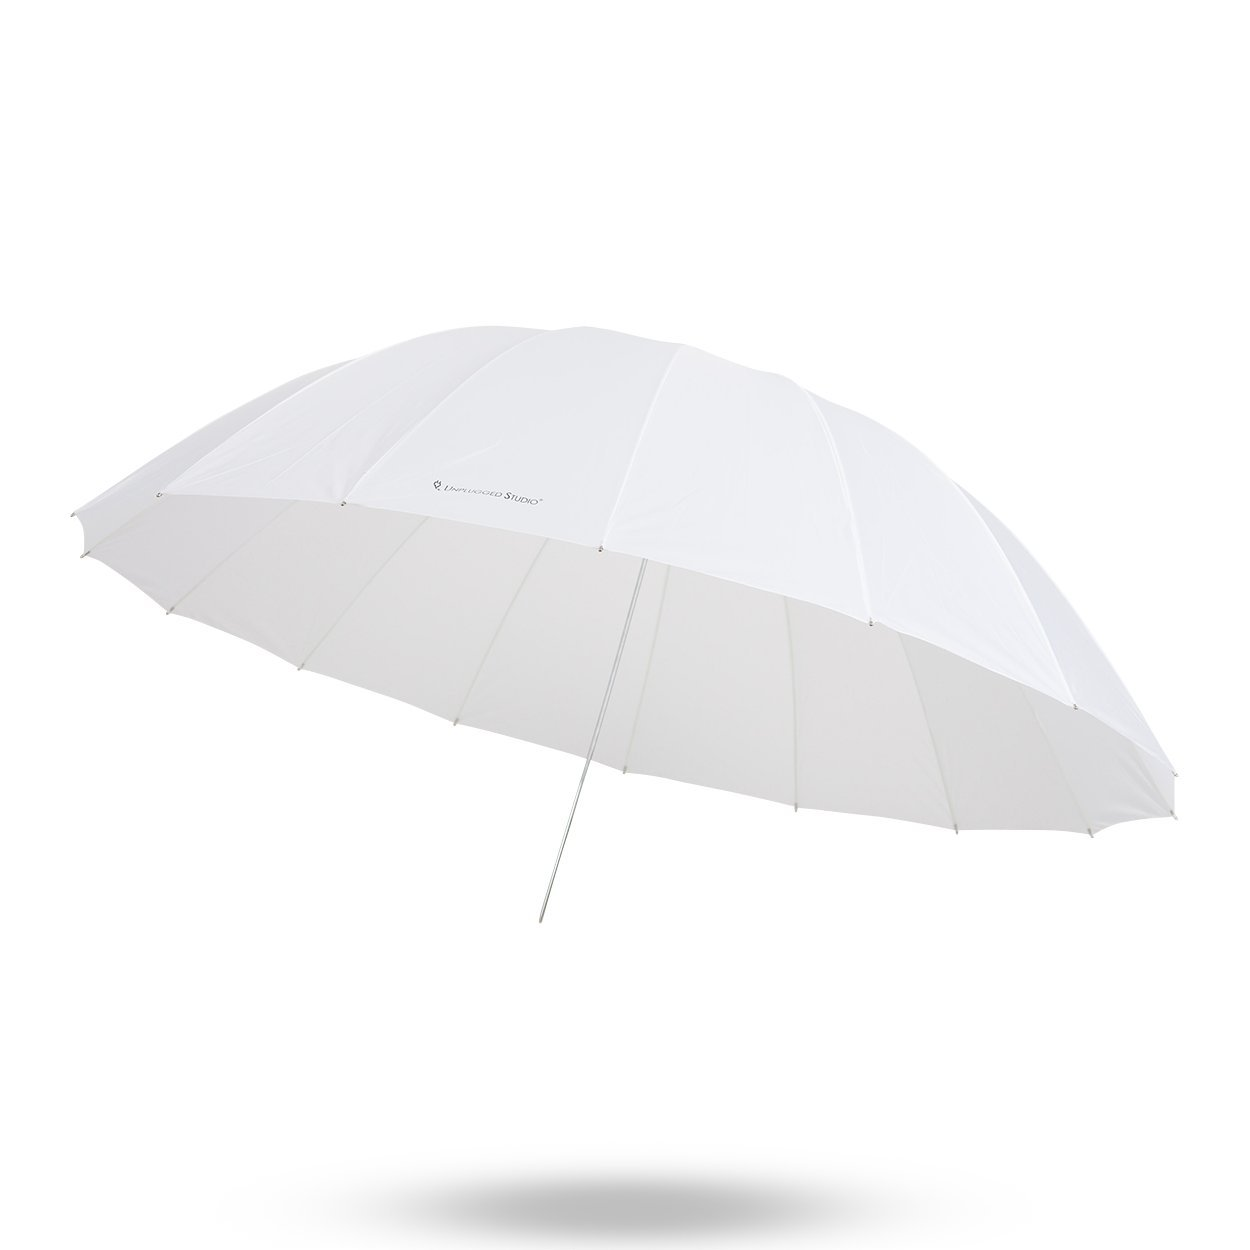 UNPLUGGED STUDIO 70inch Translucent Umbrella (16 Fiberglass Ribs) by UNPLUGGED STUDIO (Image #6)